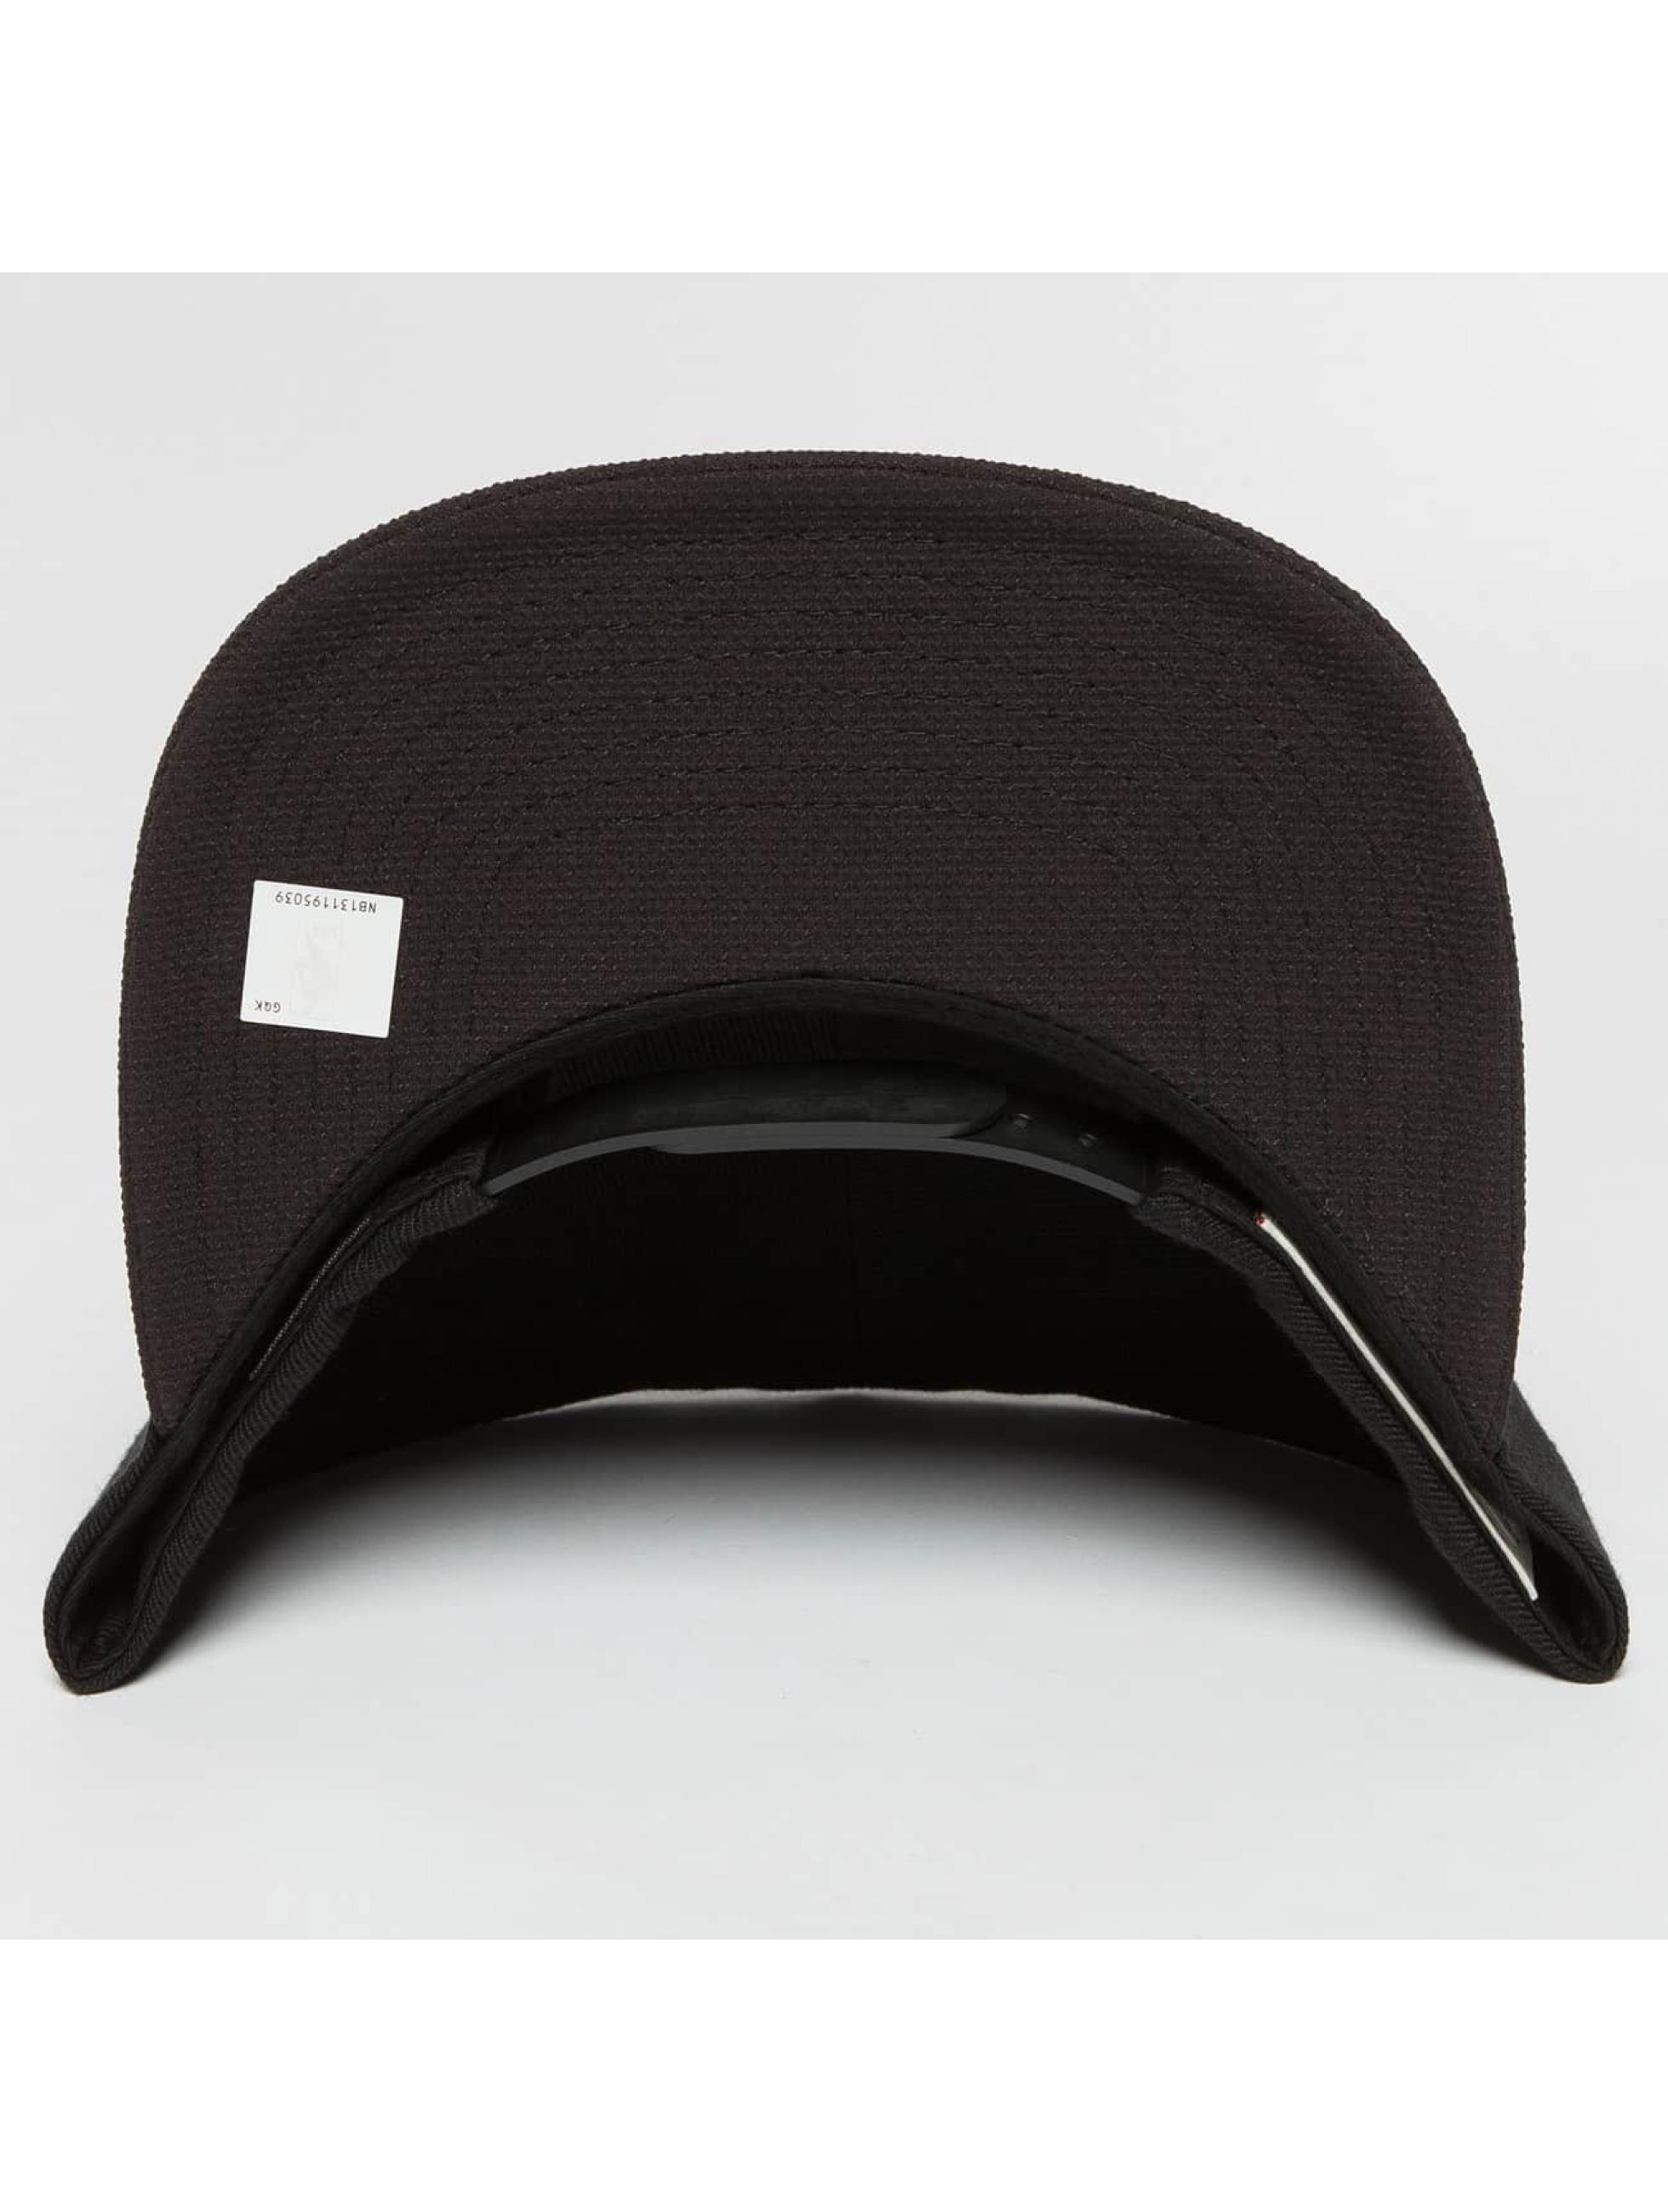 Mitchell & Ness Casquette Snapback & Strapback Full Dollar Torronto Raptors noir